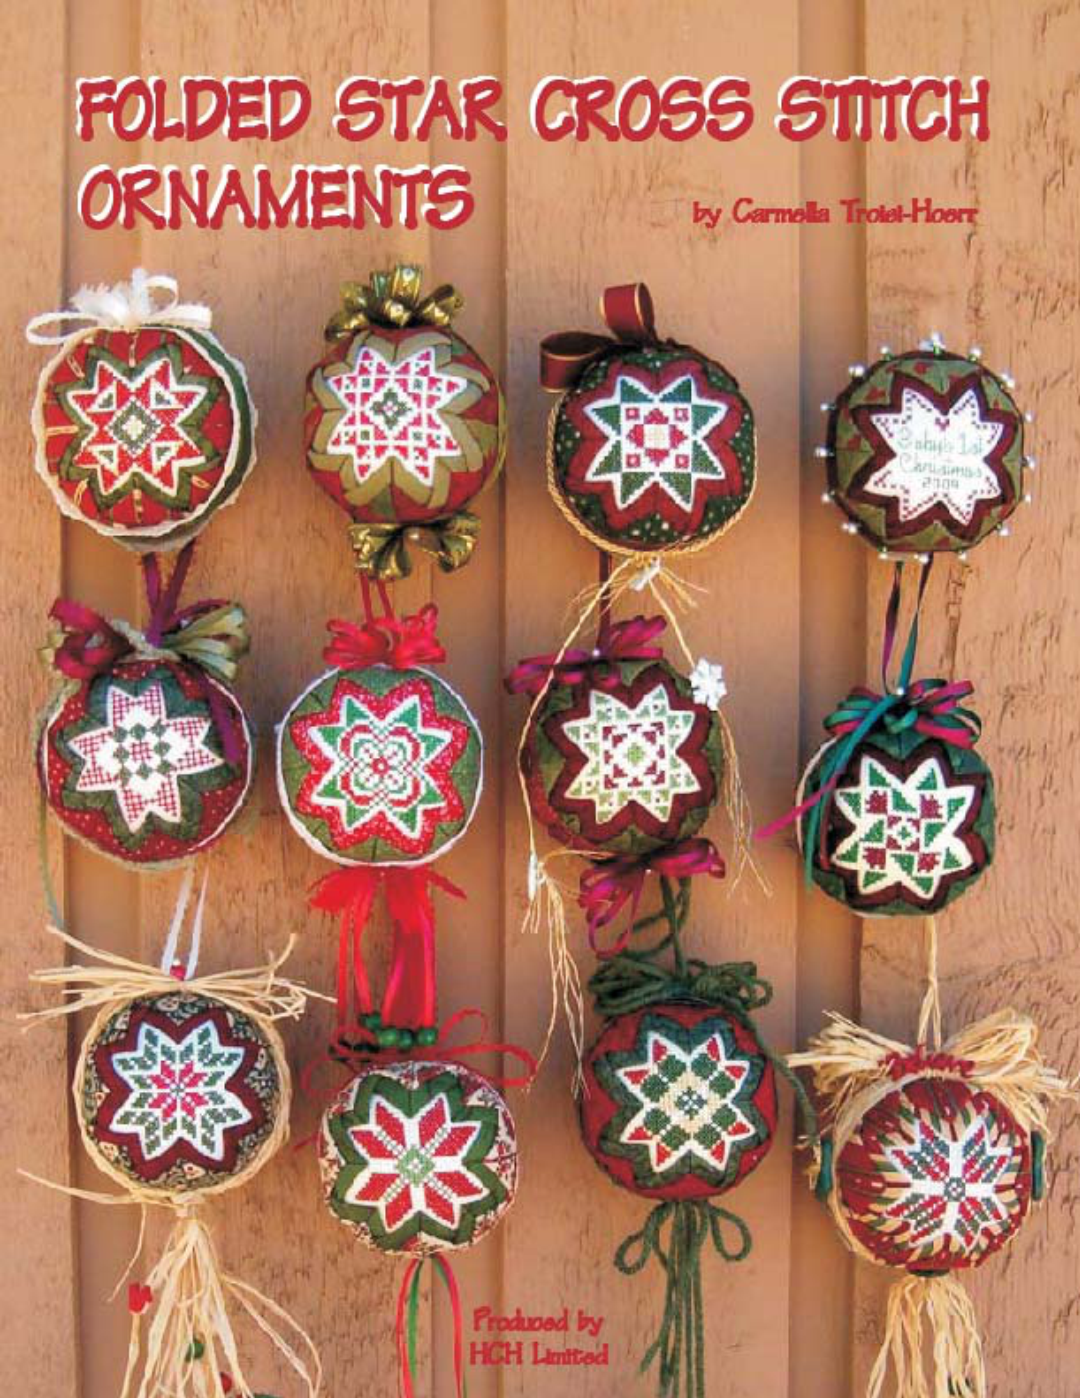 Folded Star Cross Stitch Ornaments